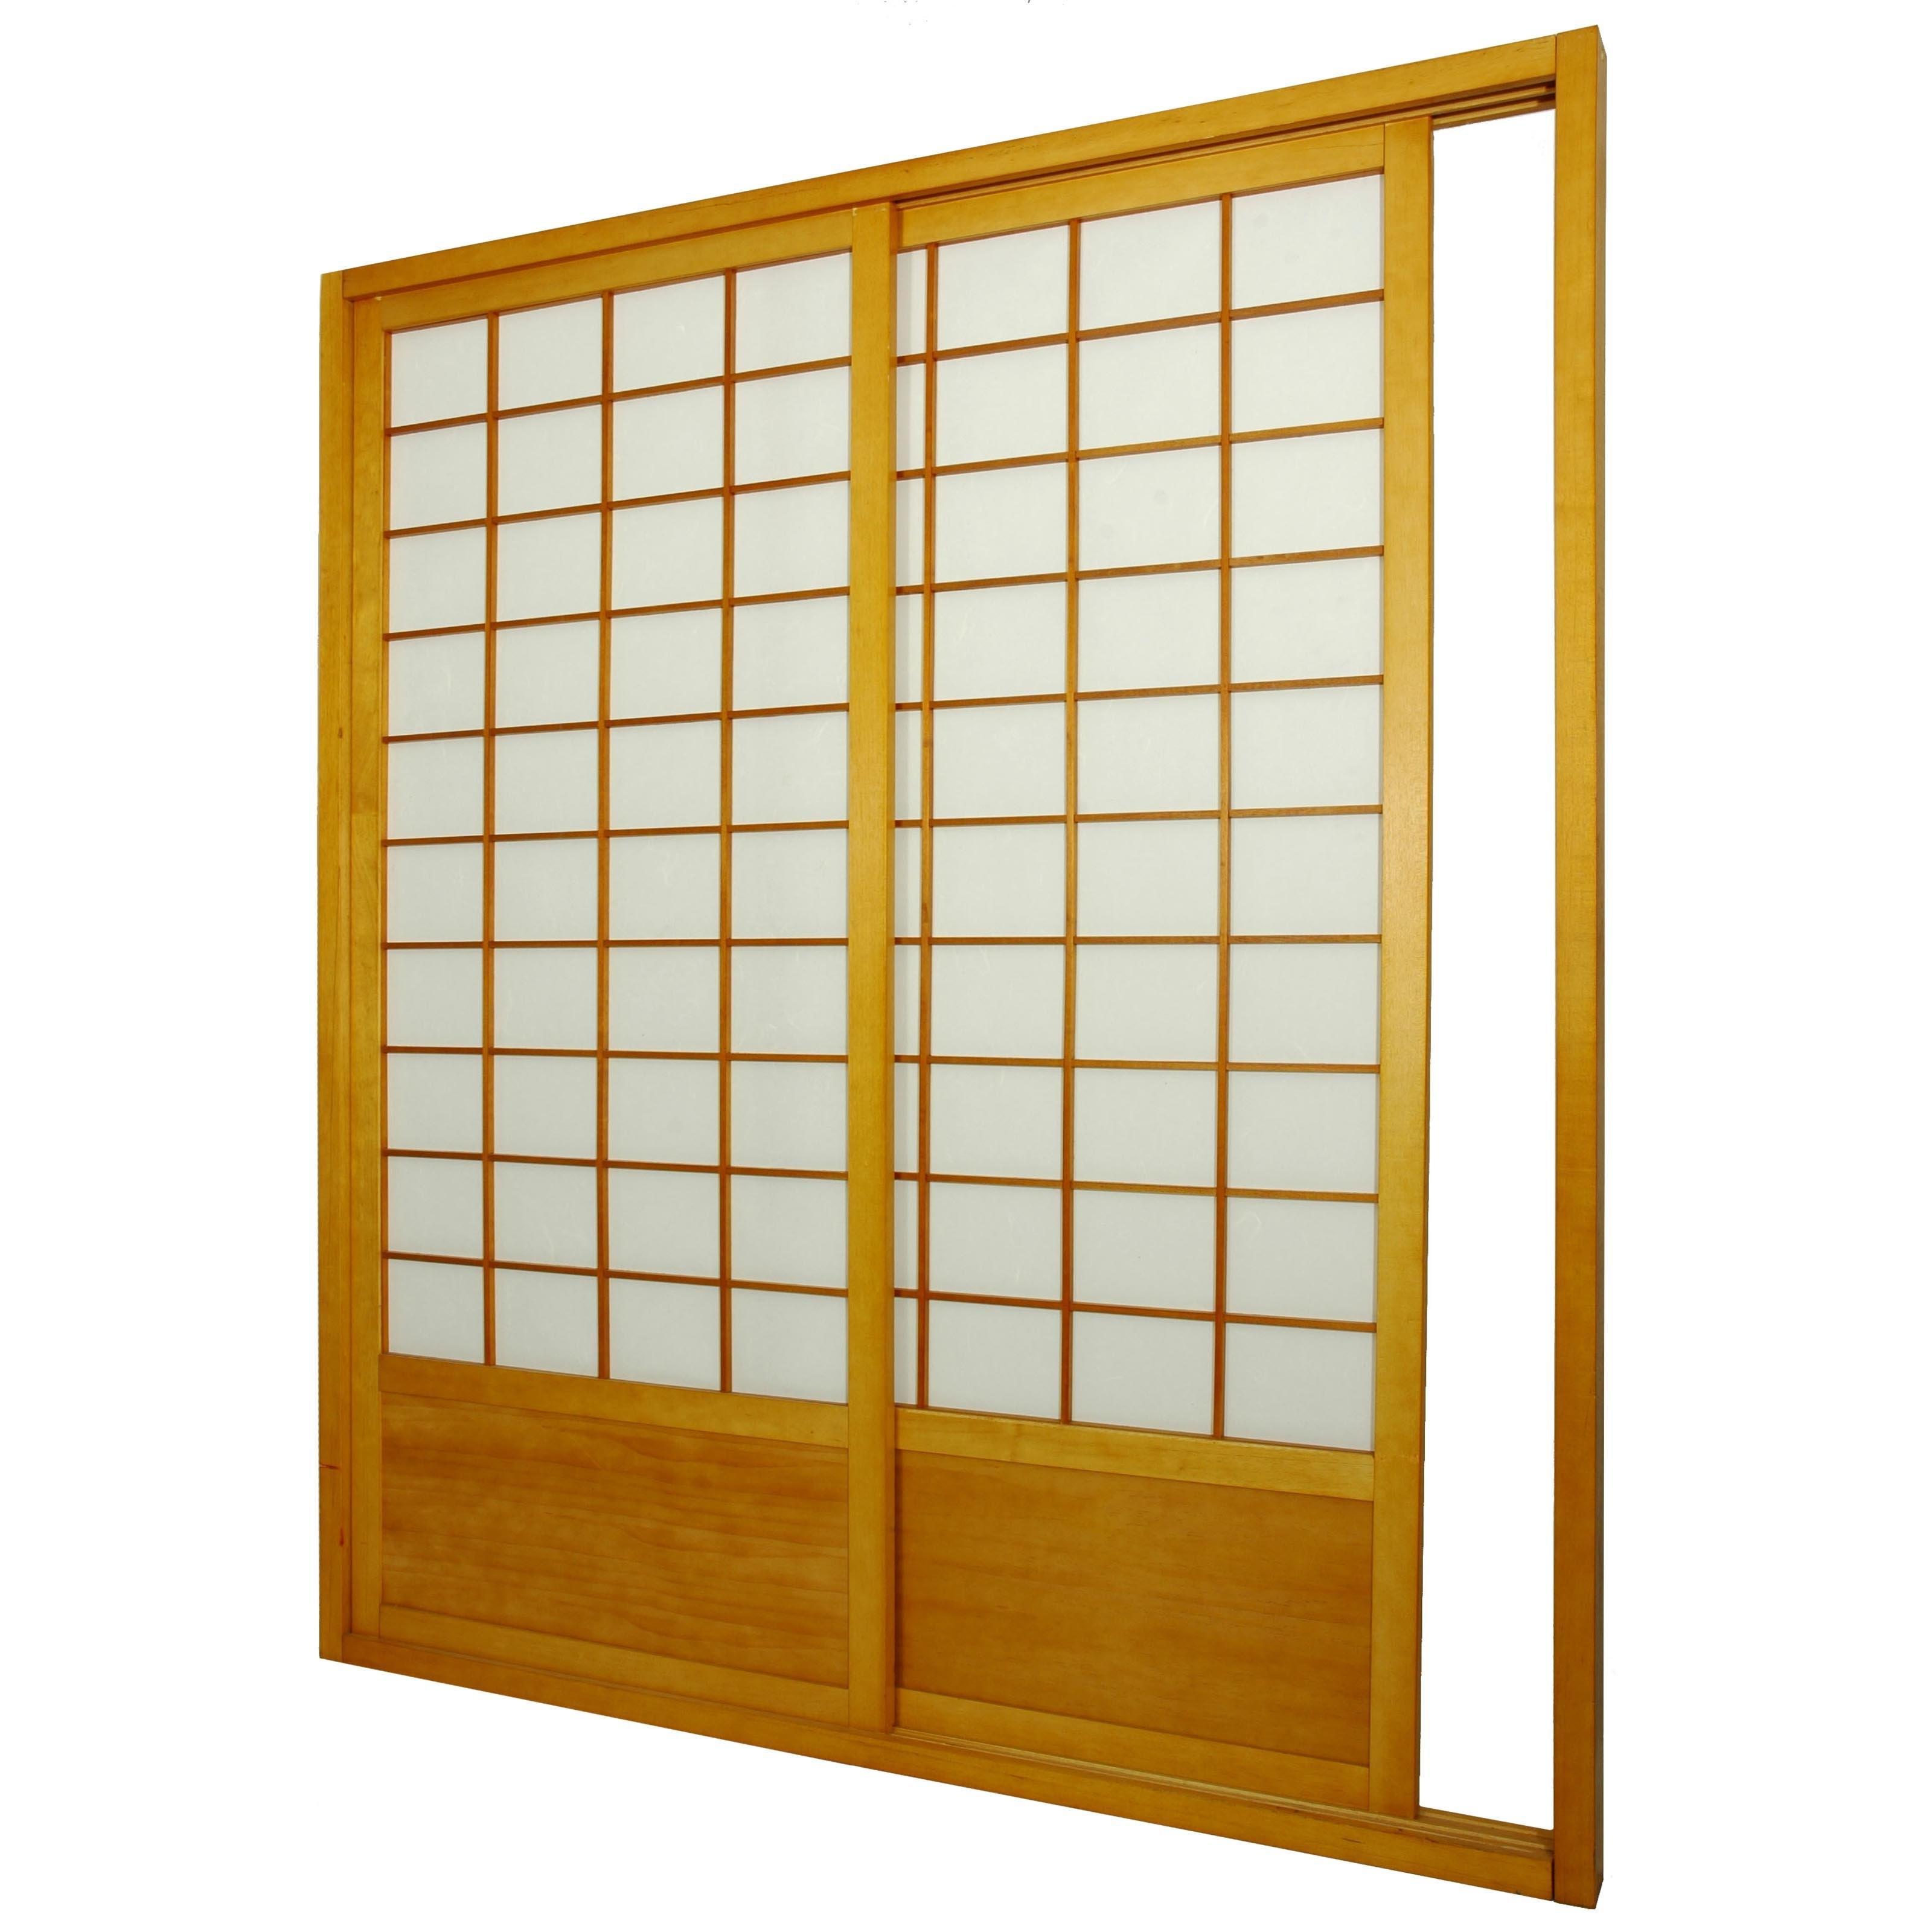 Shoji Screen Sliding Doors Kitoriental furniture bamboo tree shoji sliding door kit room